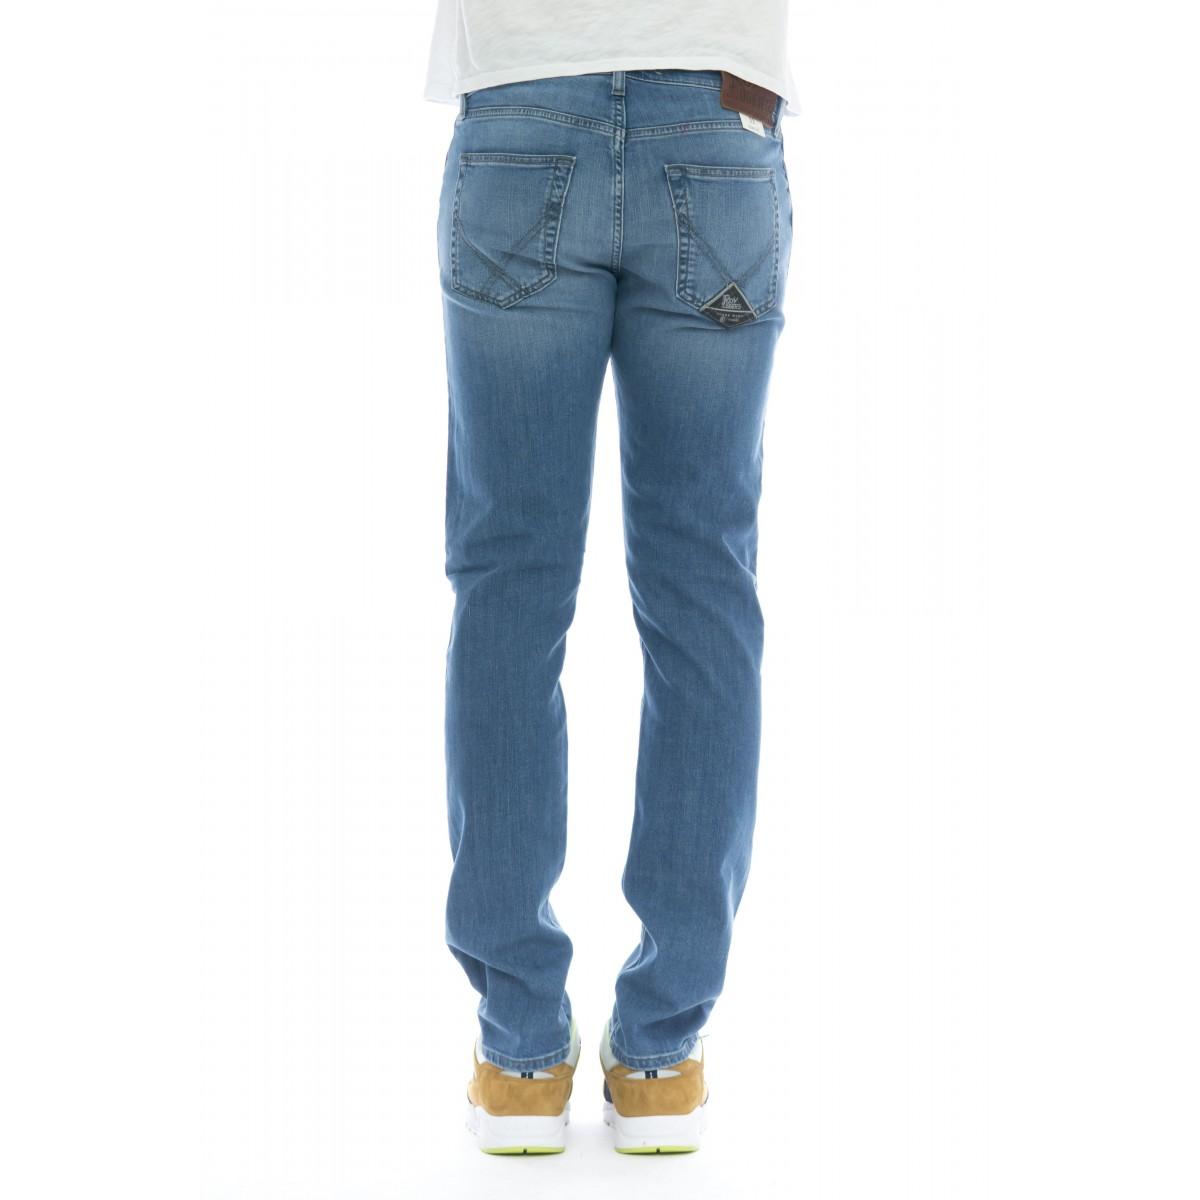 Jeans - 529 zeus